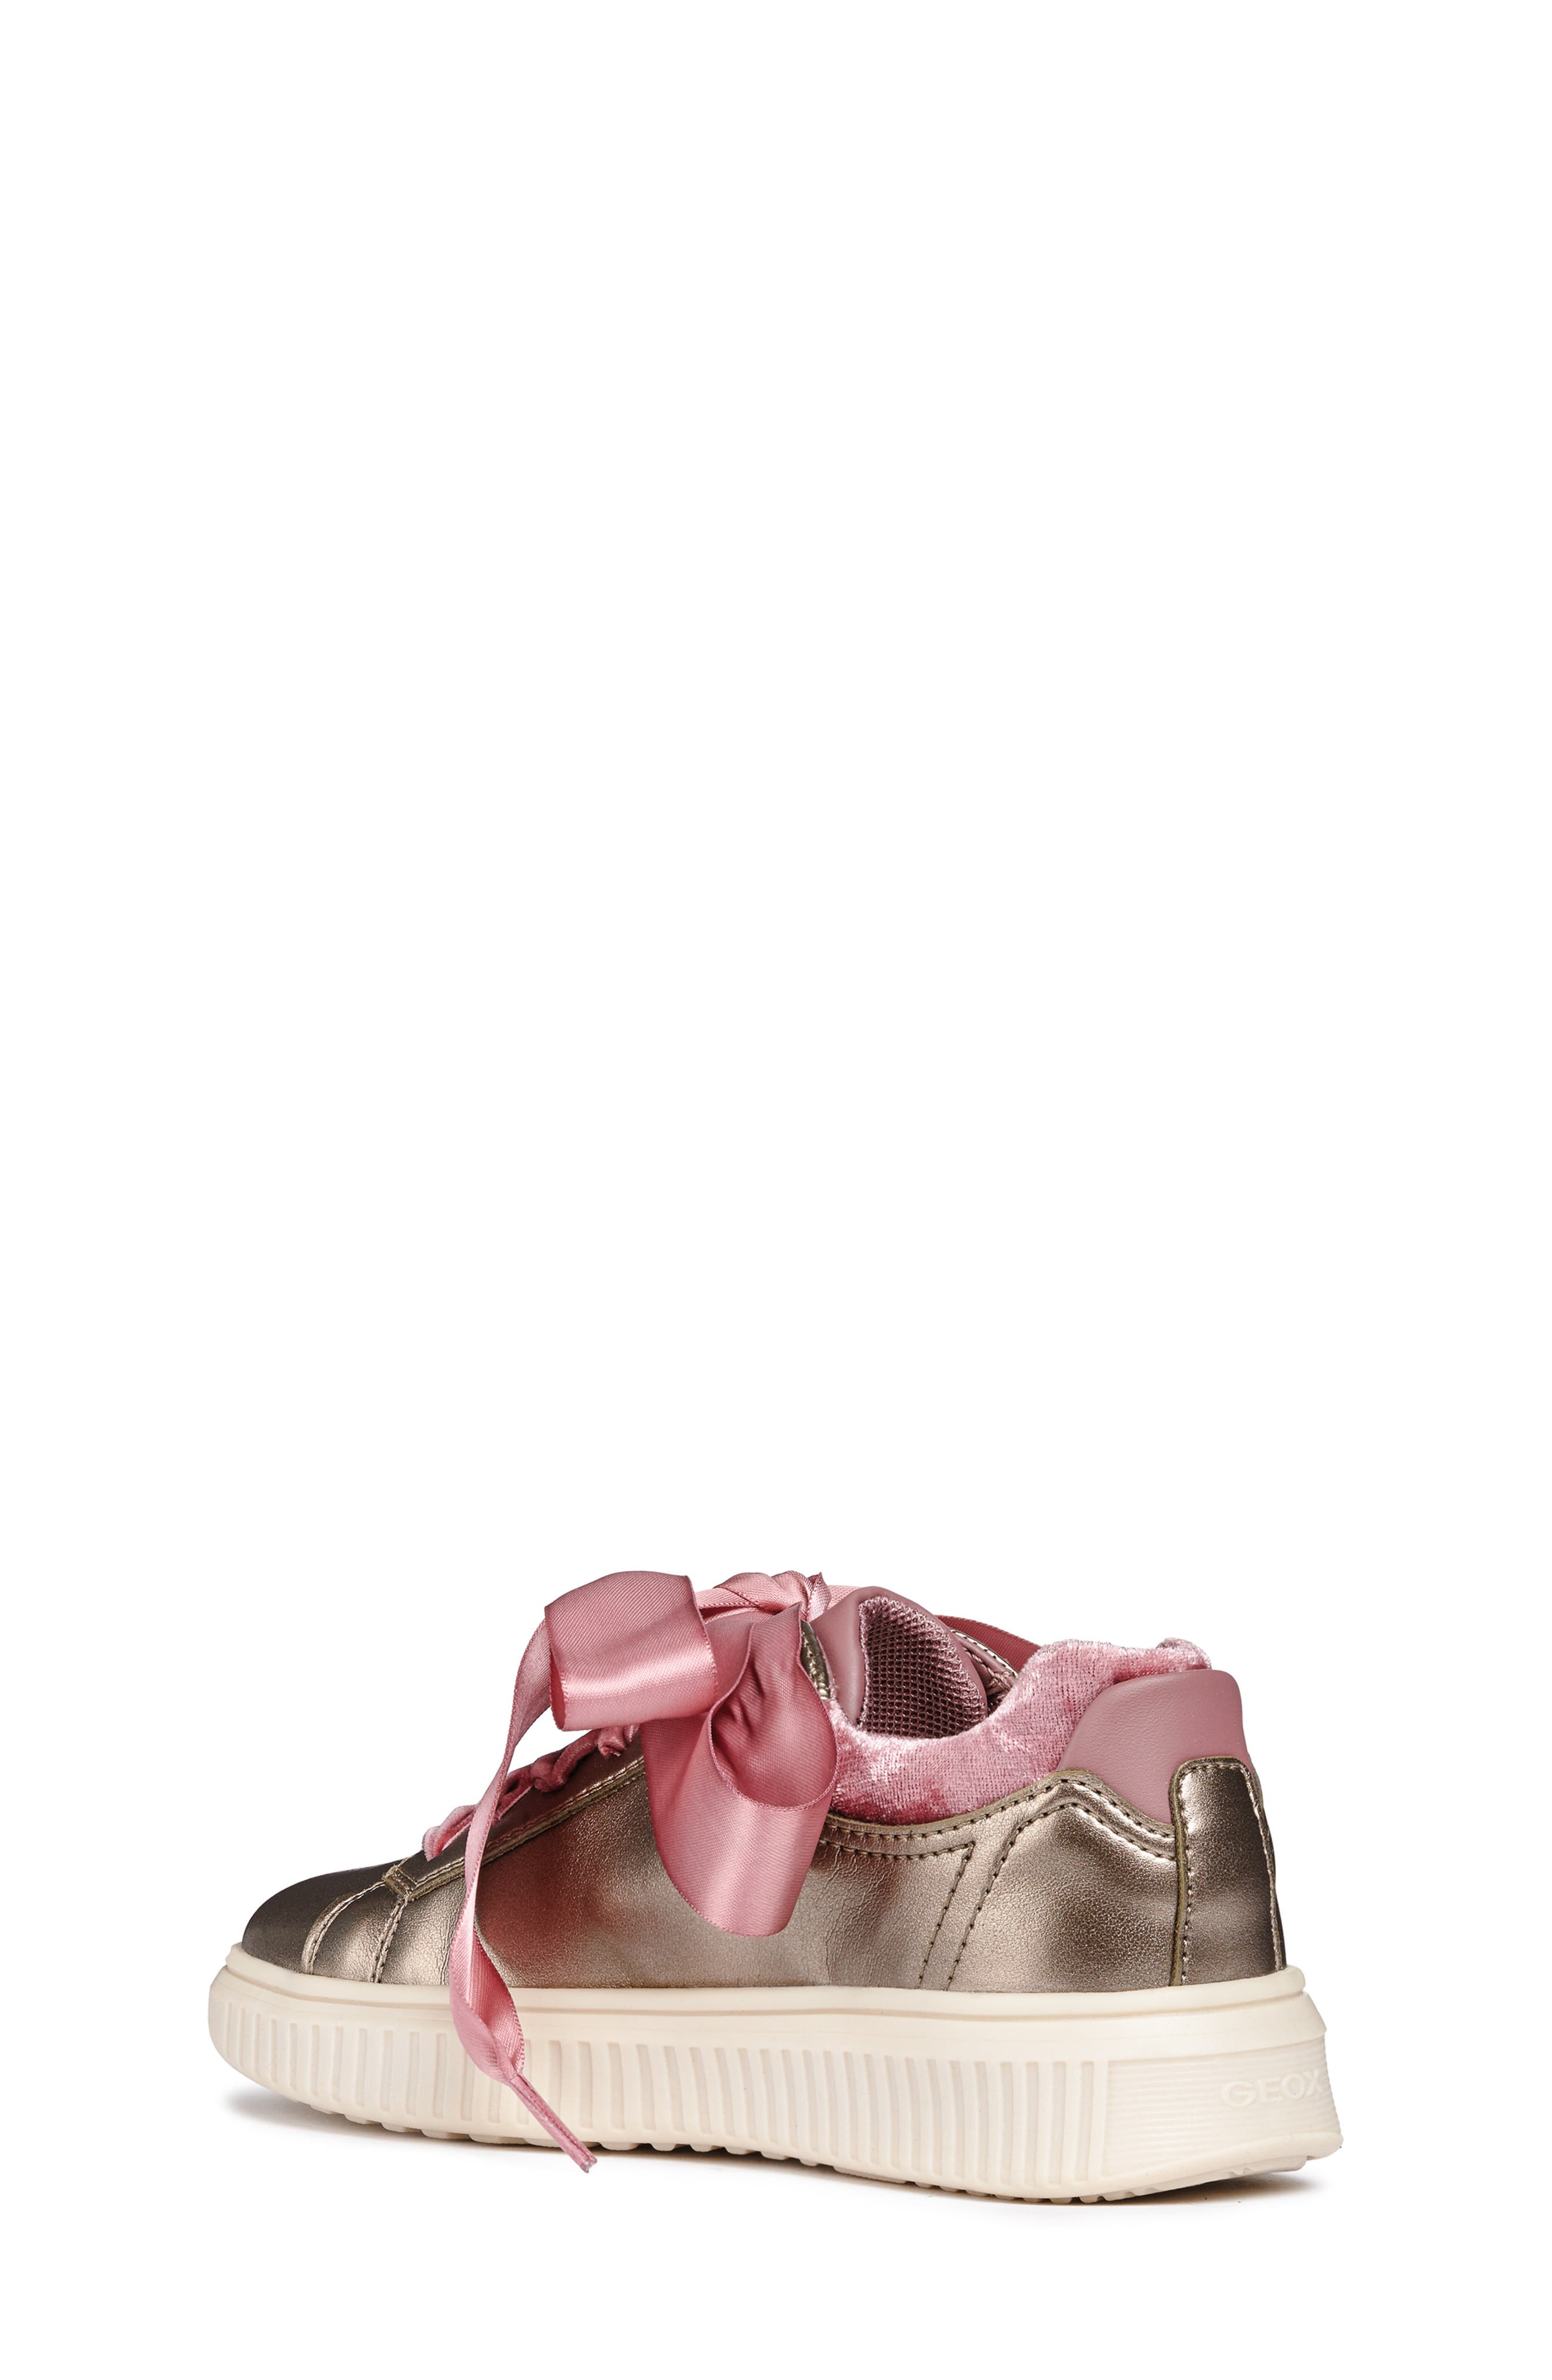 Disco Mix Sneaker,                             Alternate thumbnail 2, color,                             LEAD